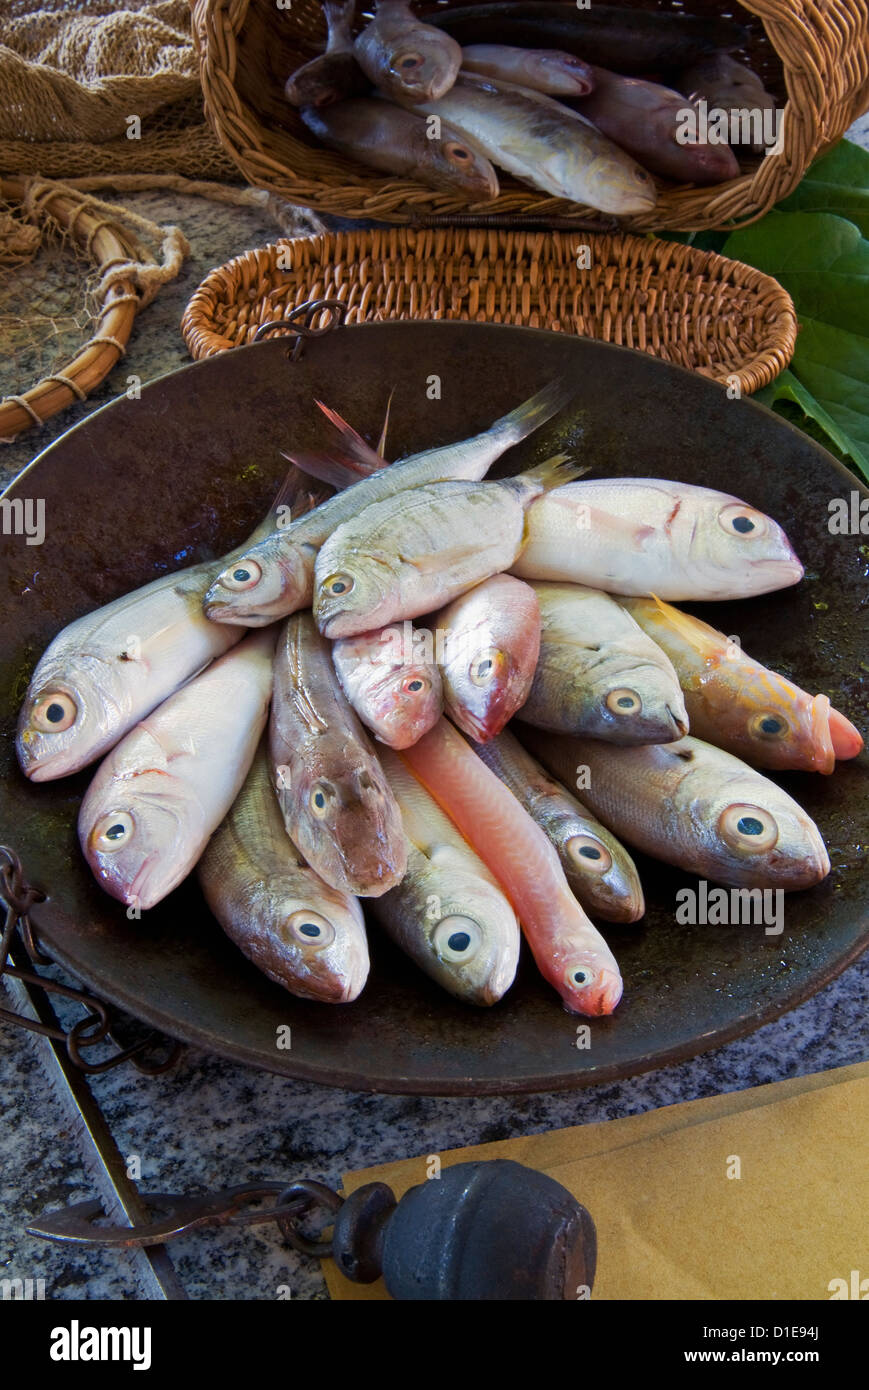 Steelyard balance containing Mediterranean fish, sea bream, tub gurnard, comber and red bandfish, Italy - Stock Image